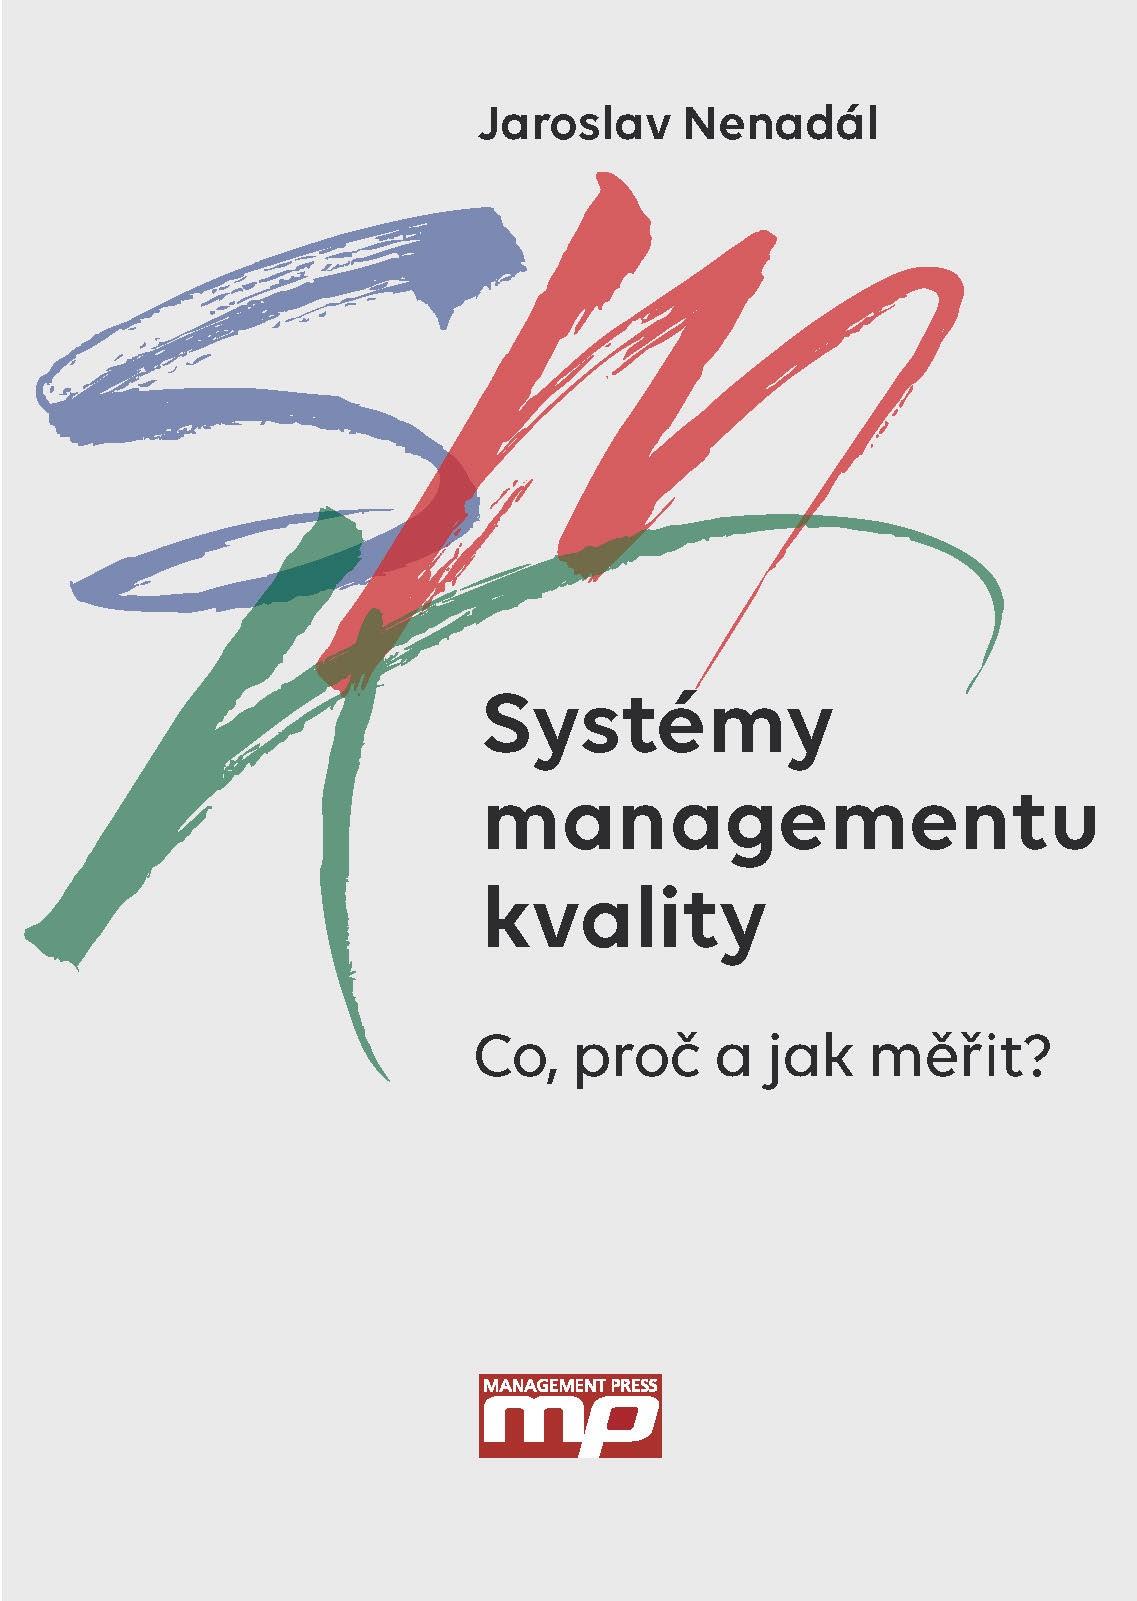 Systémy managementu kvality